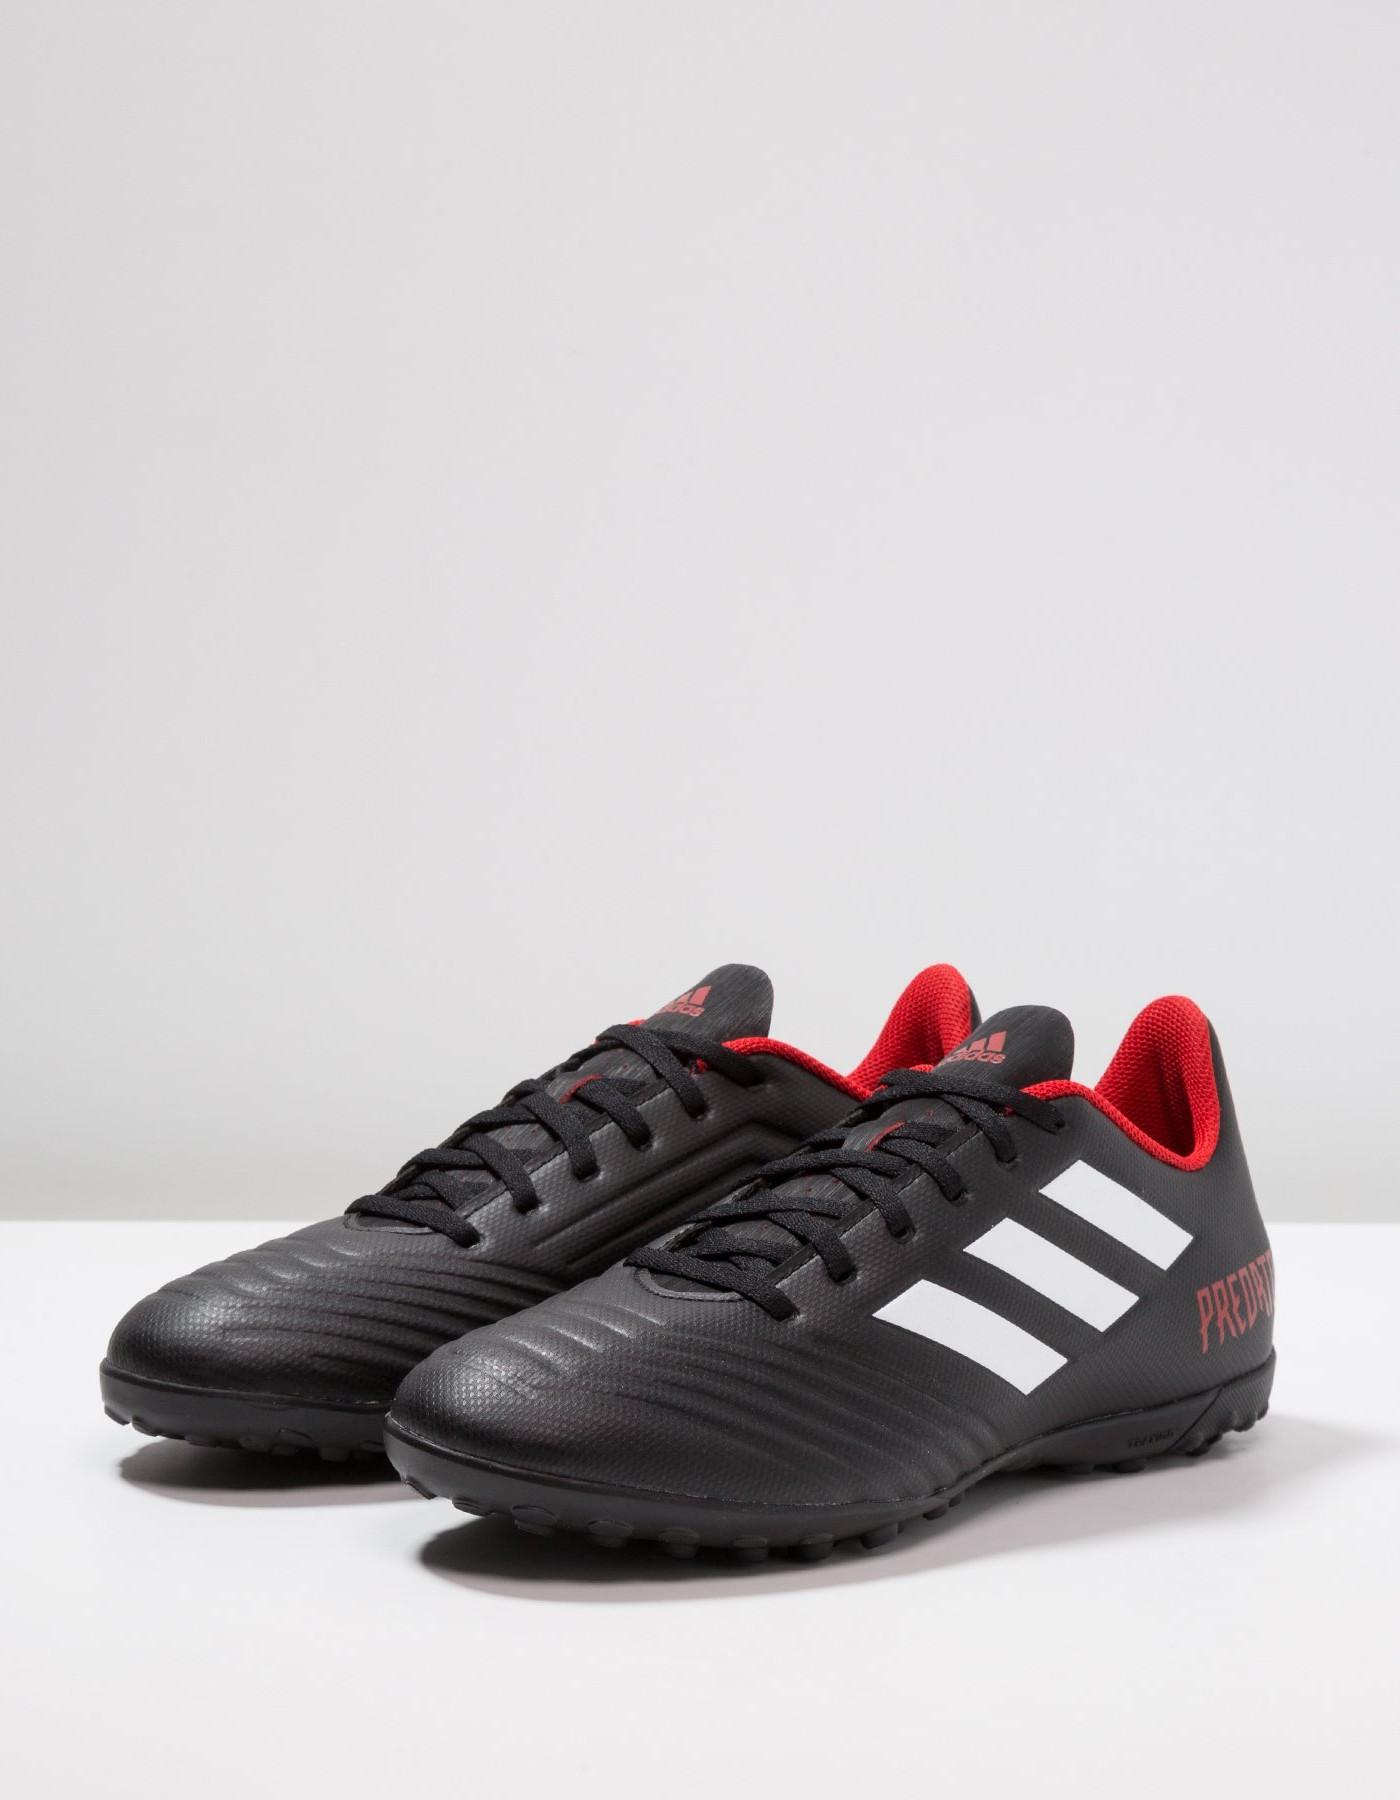 bf390c7a1cb2fc Adidas Scarpe Calcio Football Predator Tango 18.4 Turf Nero Uomo 2018  Calcetto